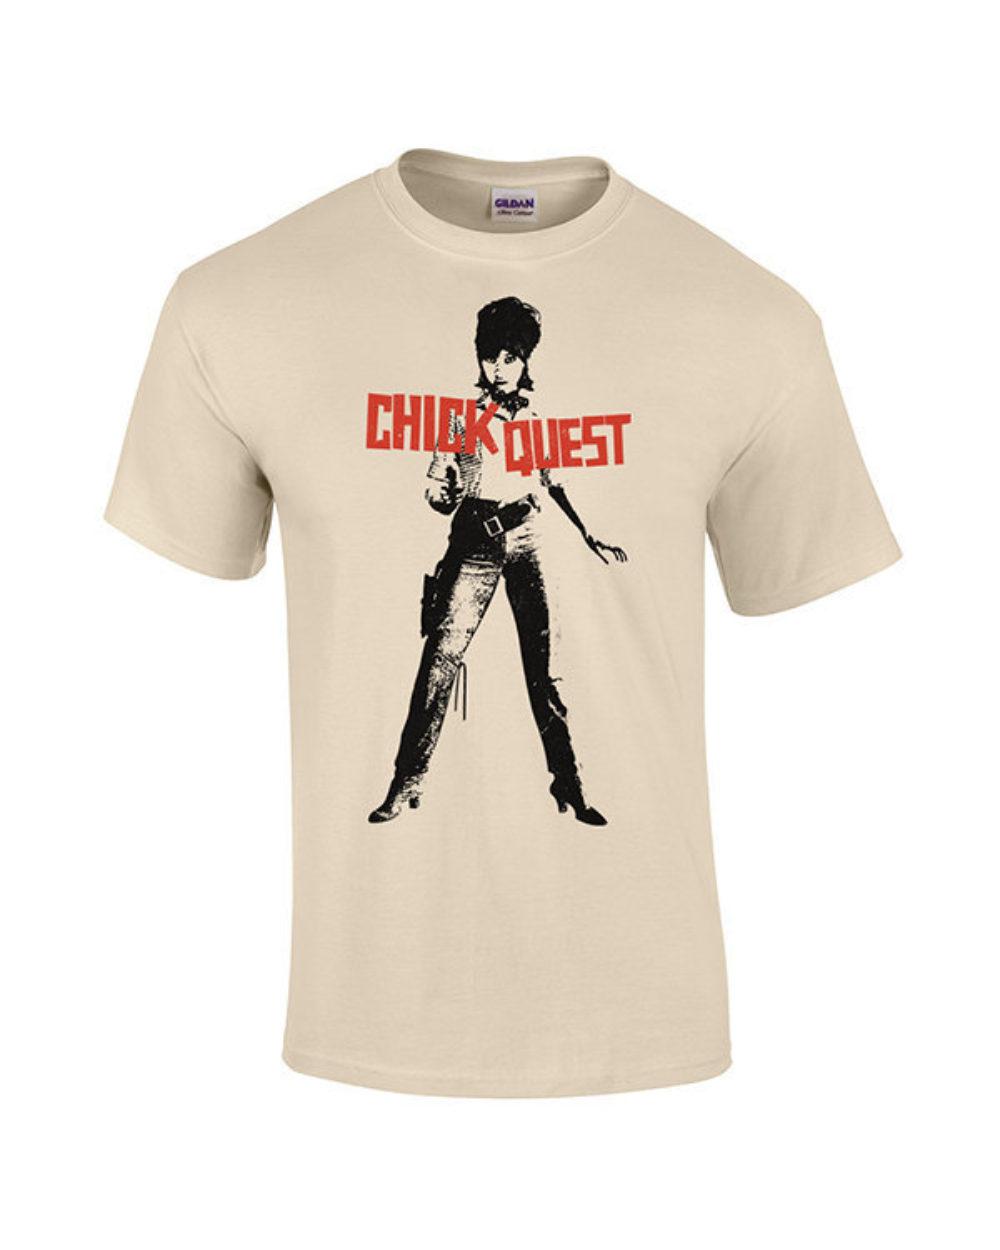 T-shirt (Sand) image